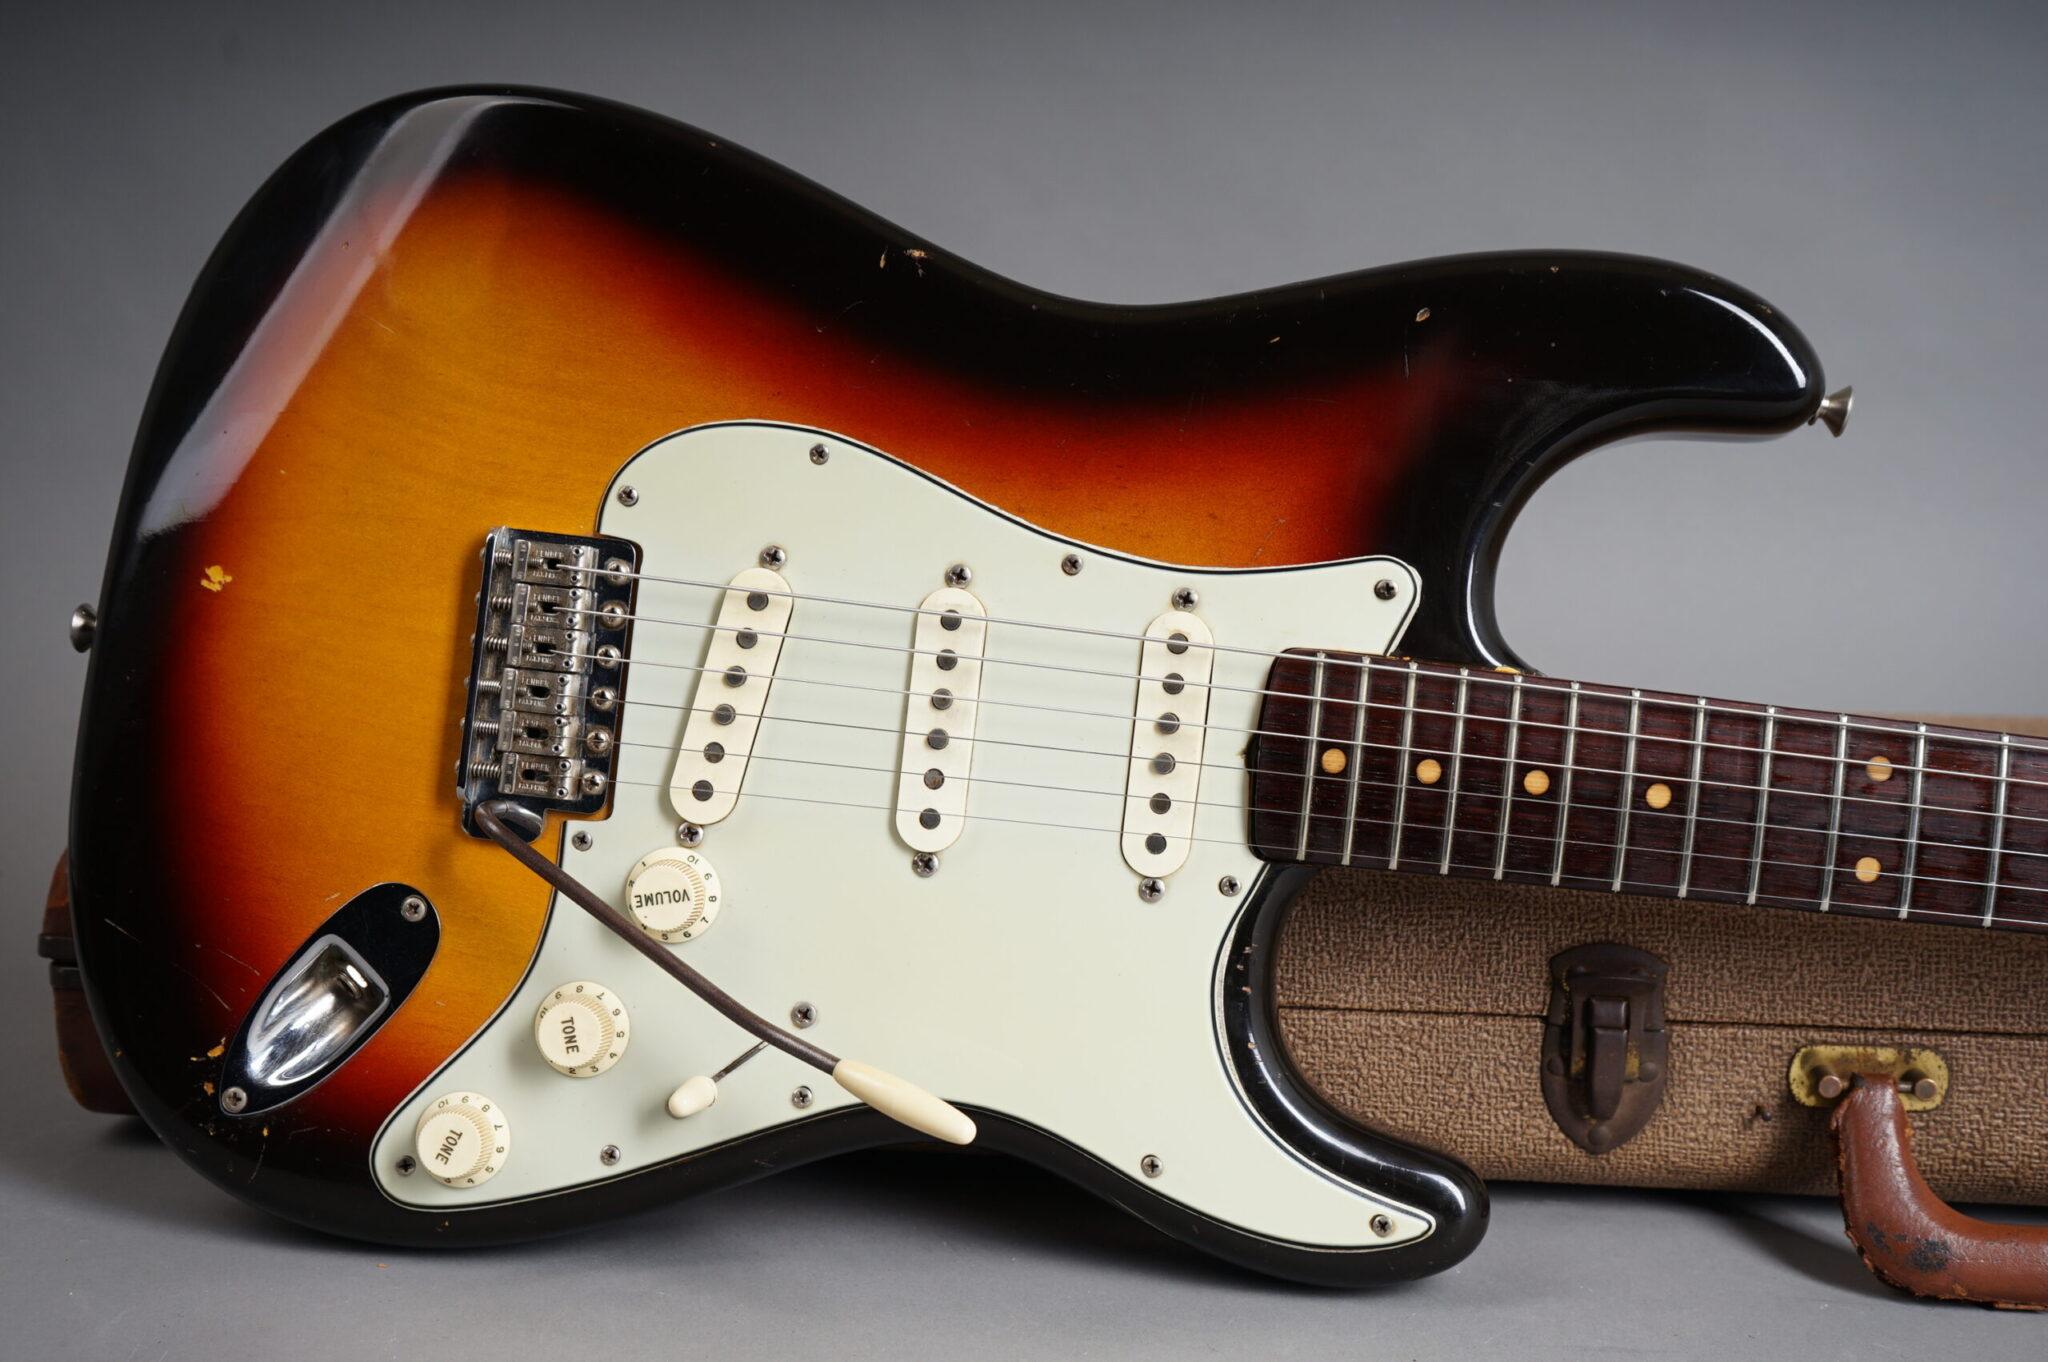 https://guitarpoint.de/app/uploads/products/1963-fender-stratocaster-sunburst-4/1963-Fender-Stratocaster-Sunburst-95643-8-scaled-2048x1362.jpg